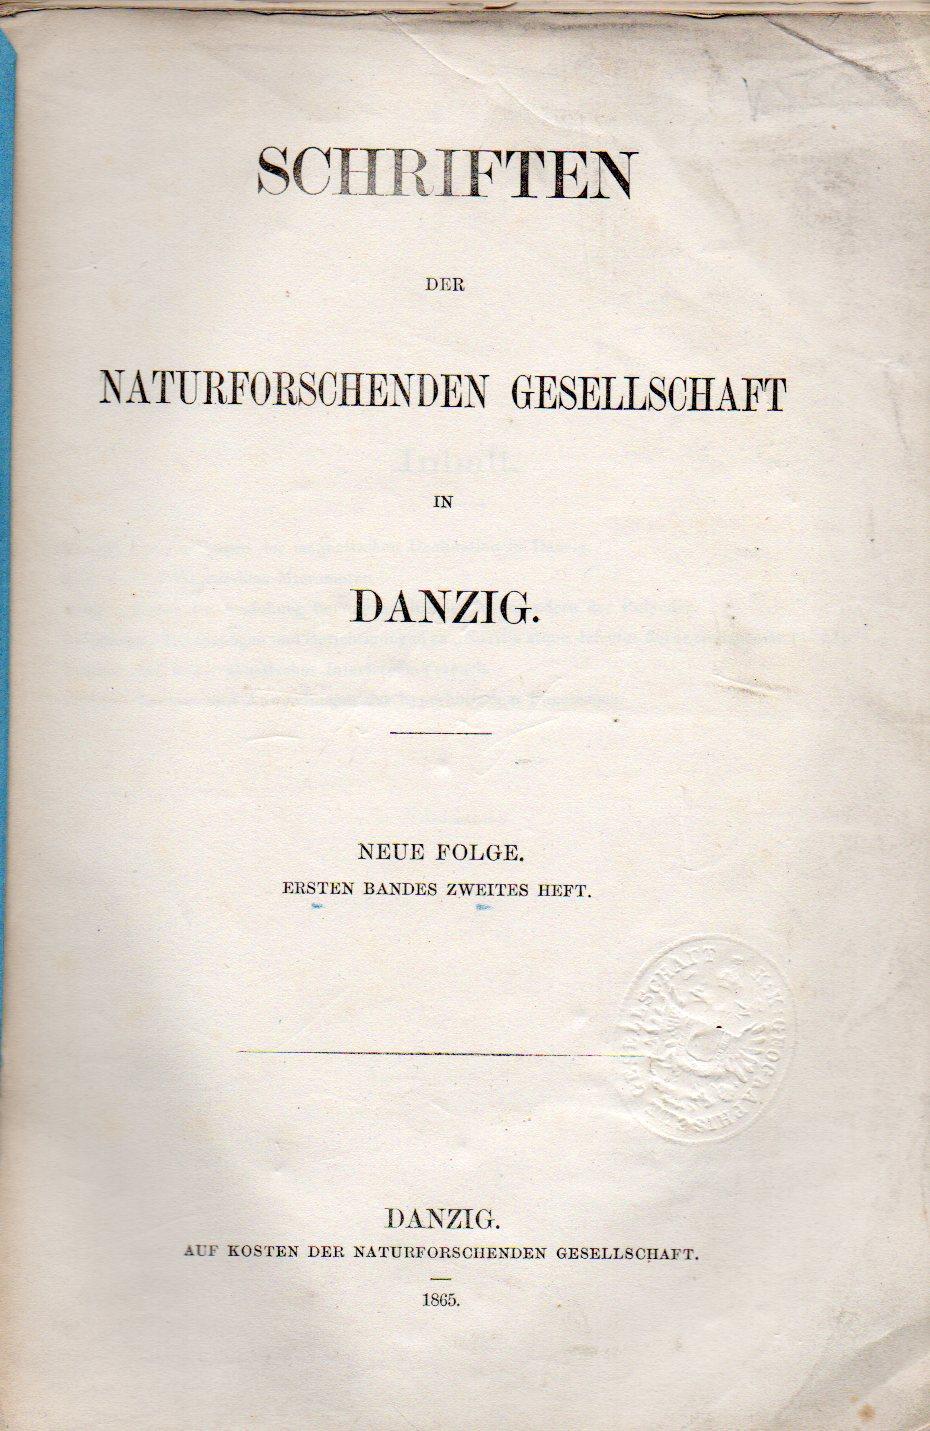 Beobachtungen der magnetischen Declination in Danzing: Kayser,E.